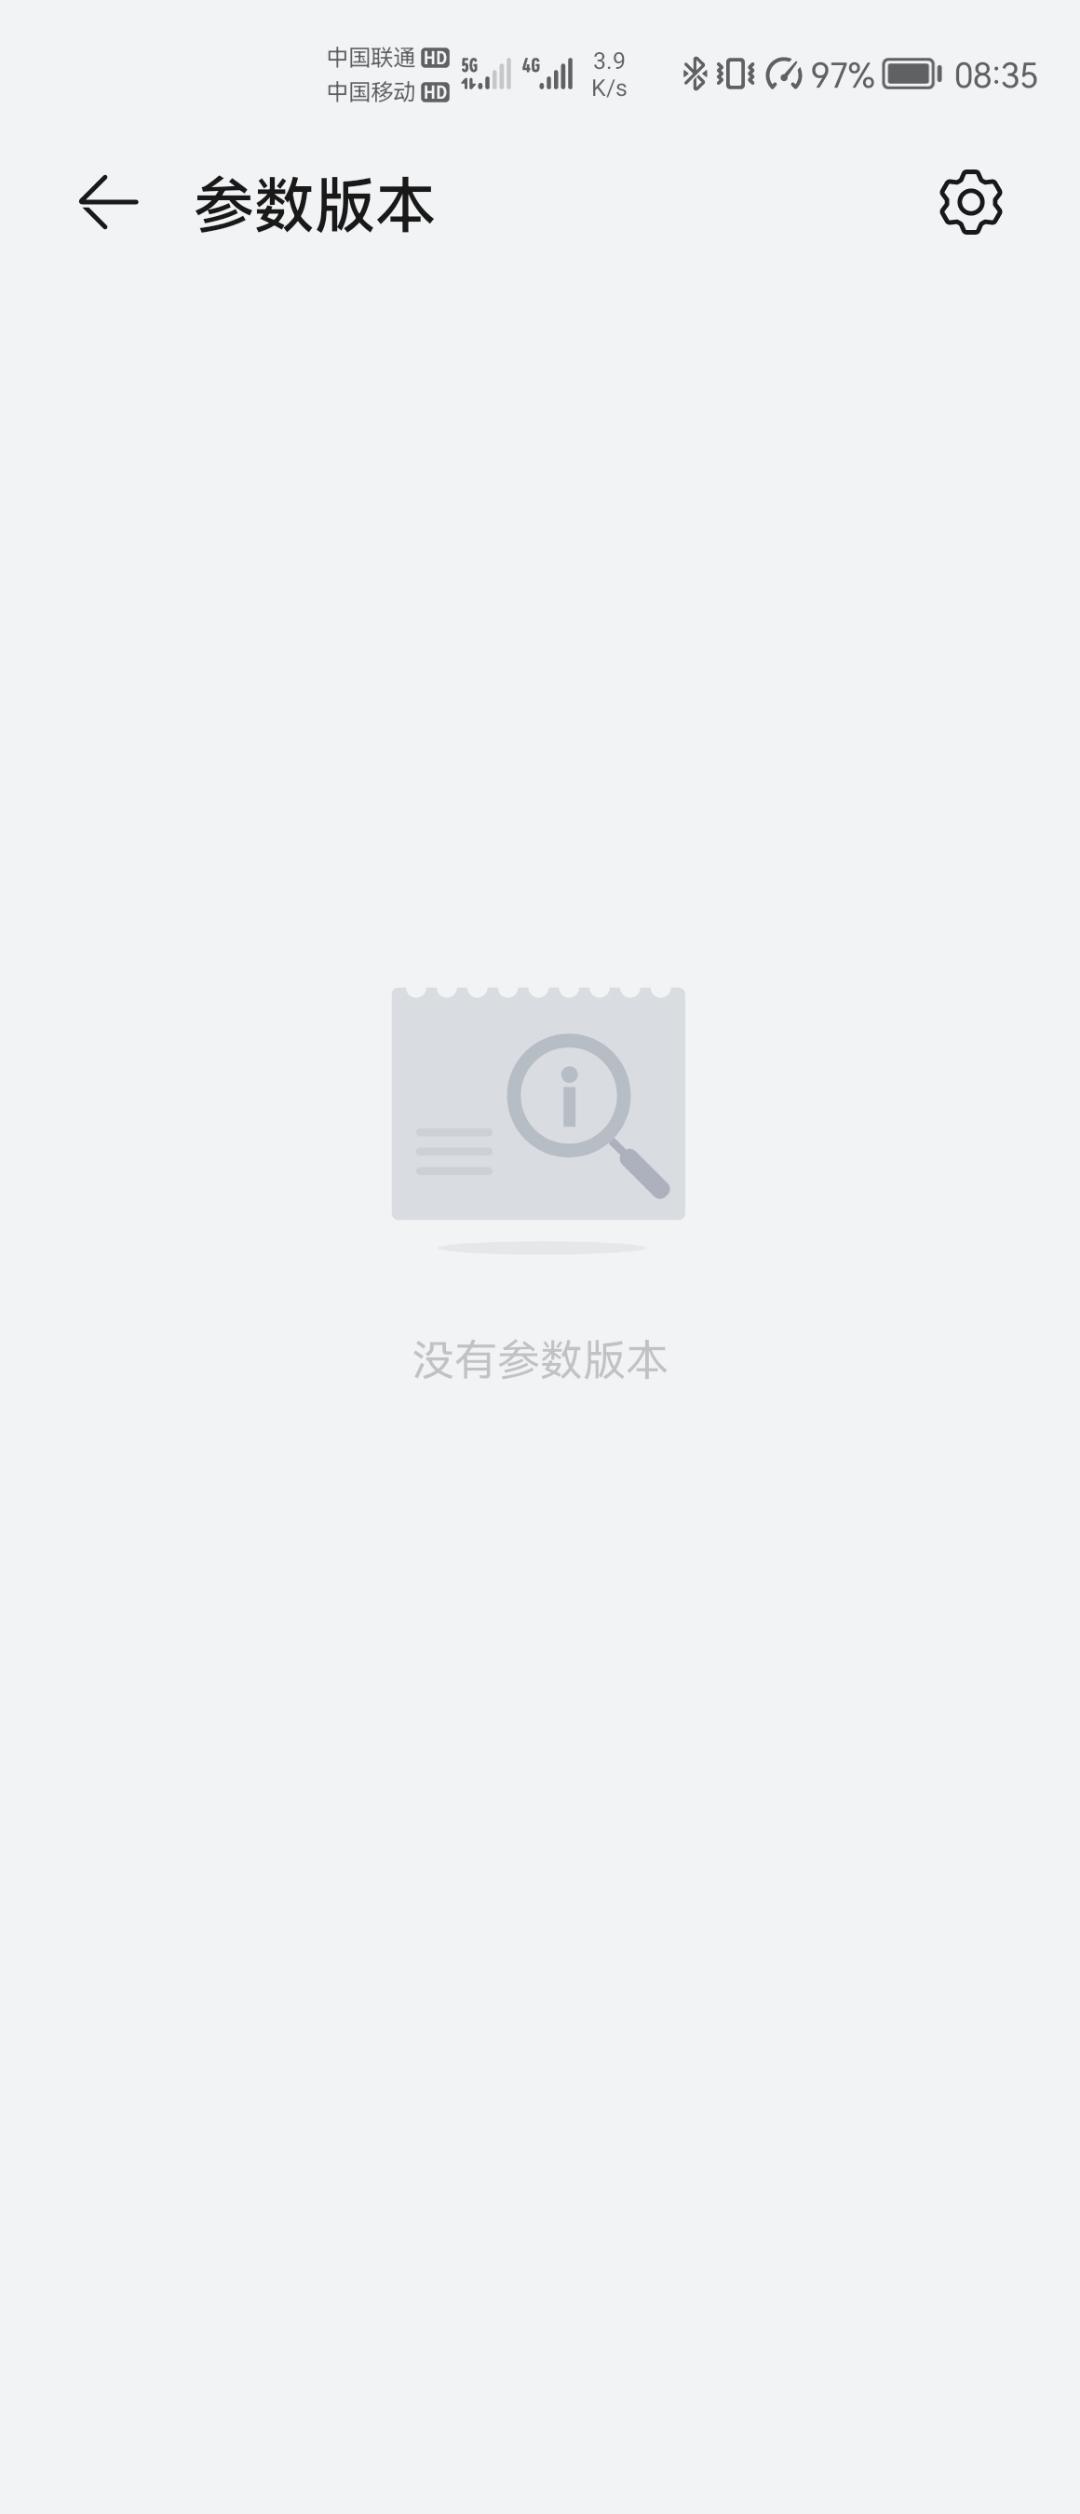 Screenshot_20210629_083504_com.huawei.android.hwouc.jpg